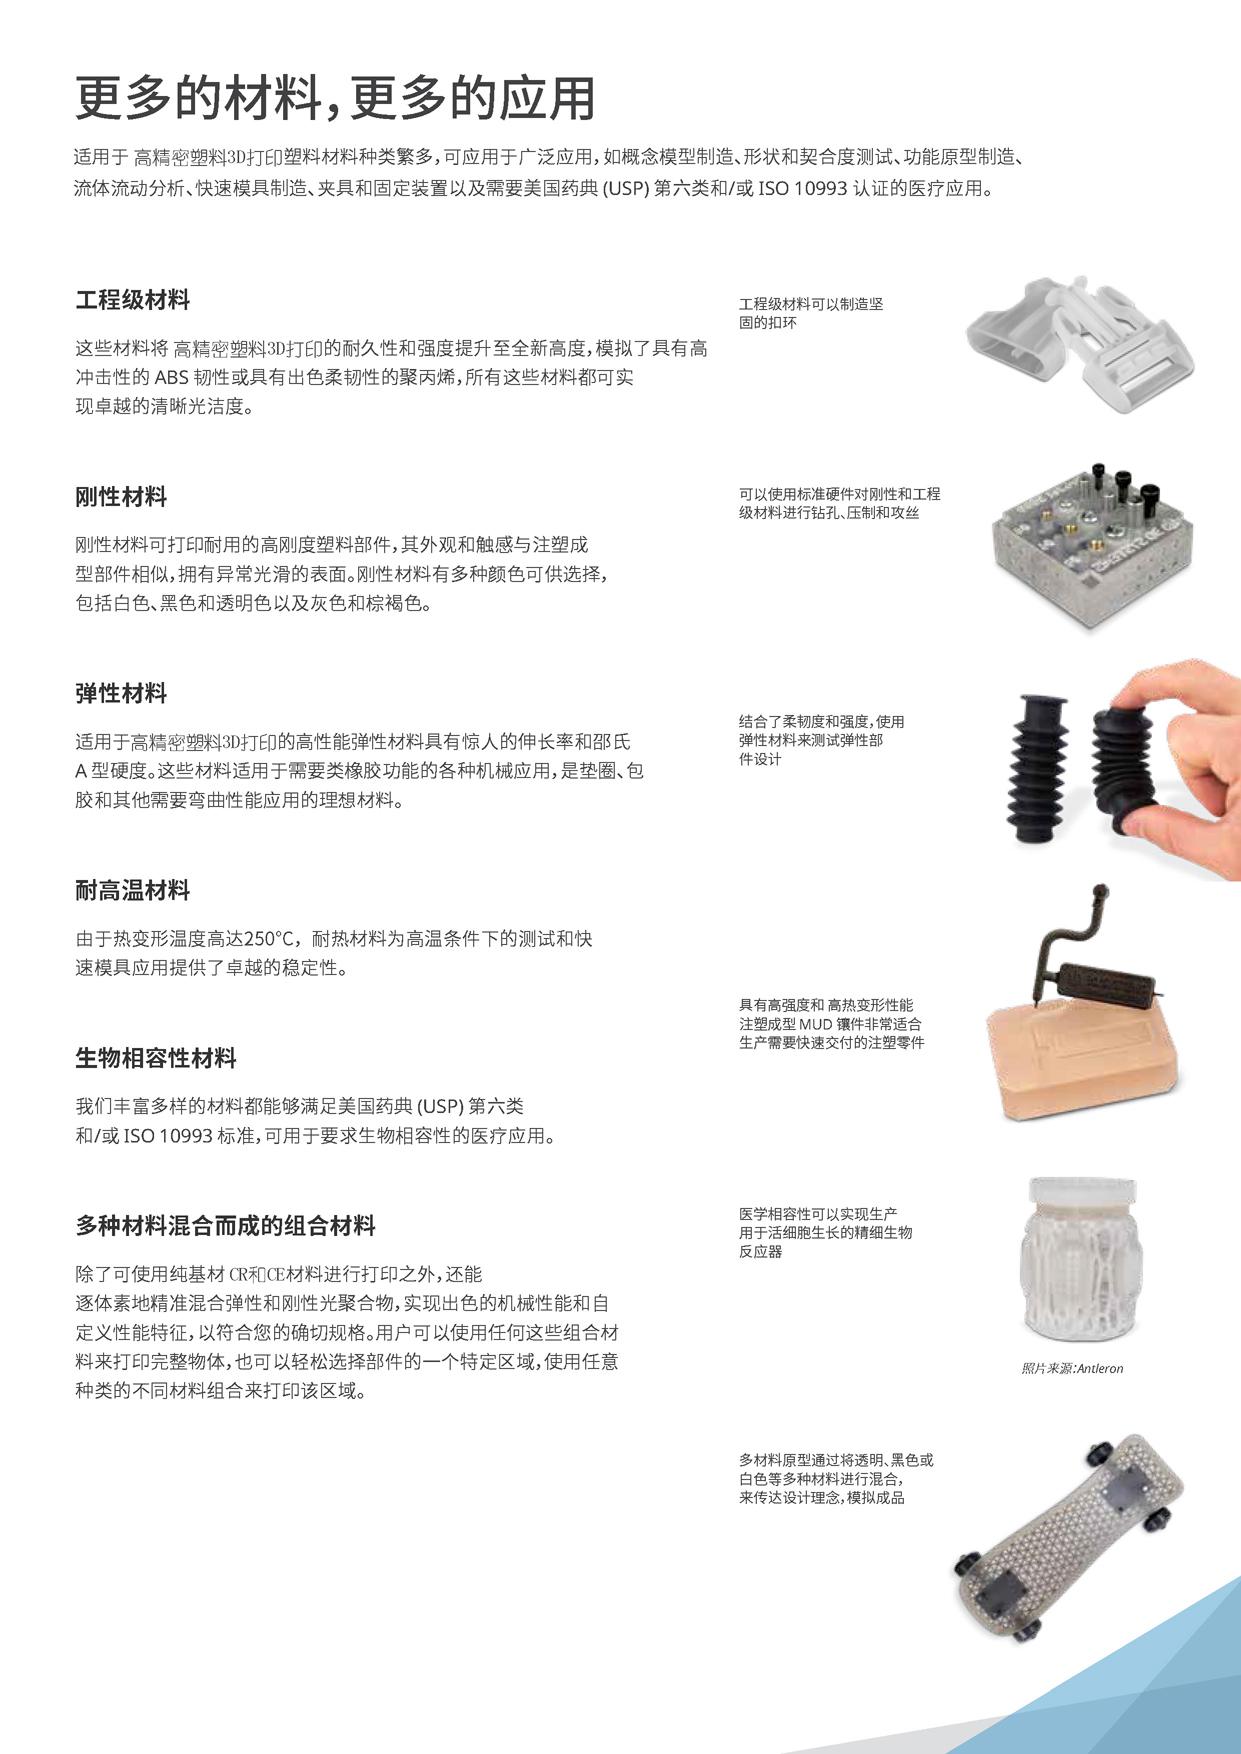 MJP-brochure-cn_页面_3.jpg